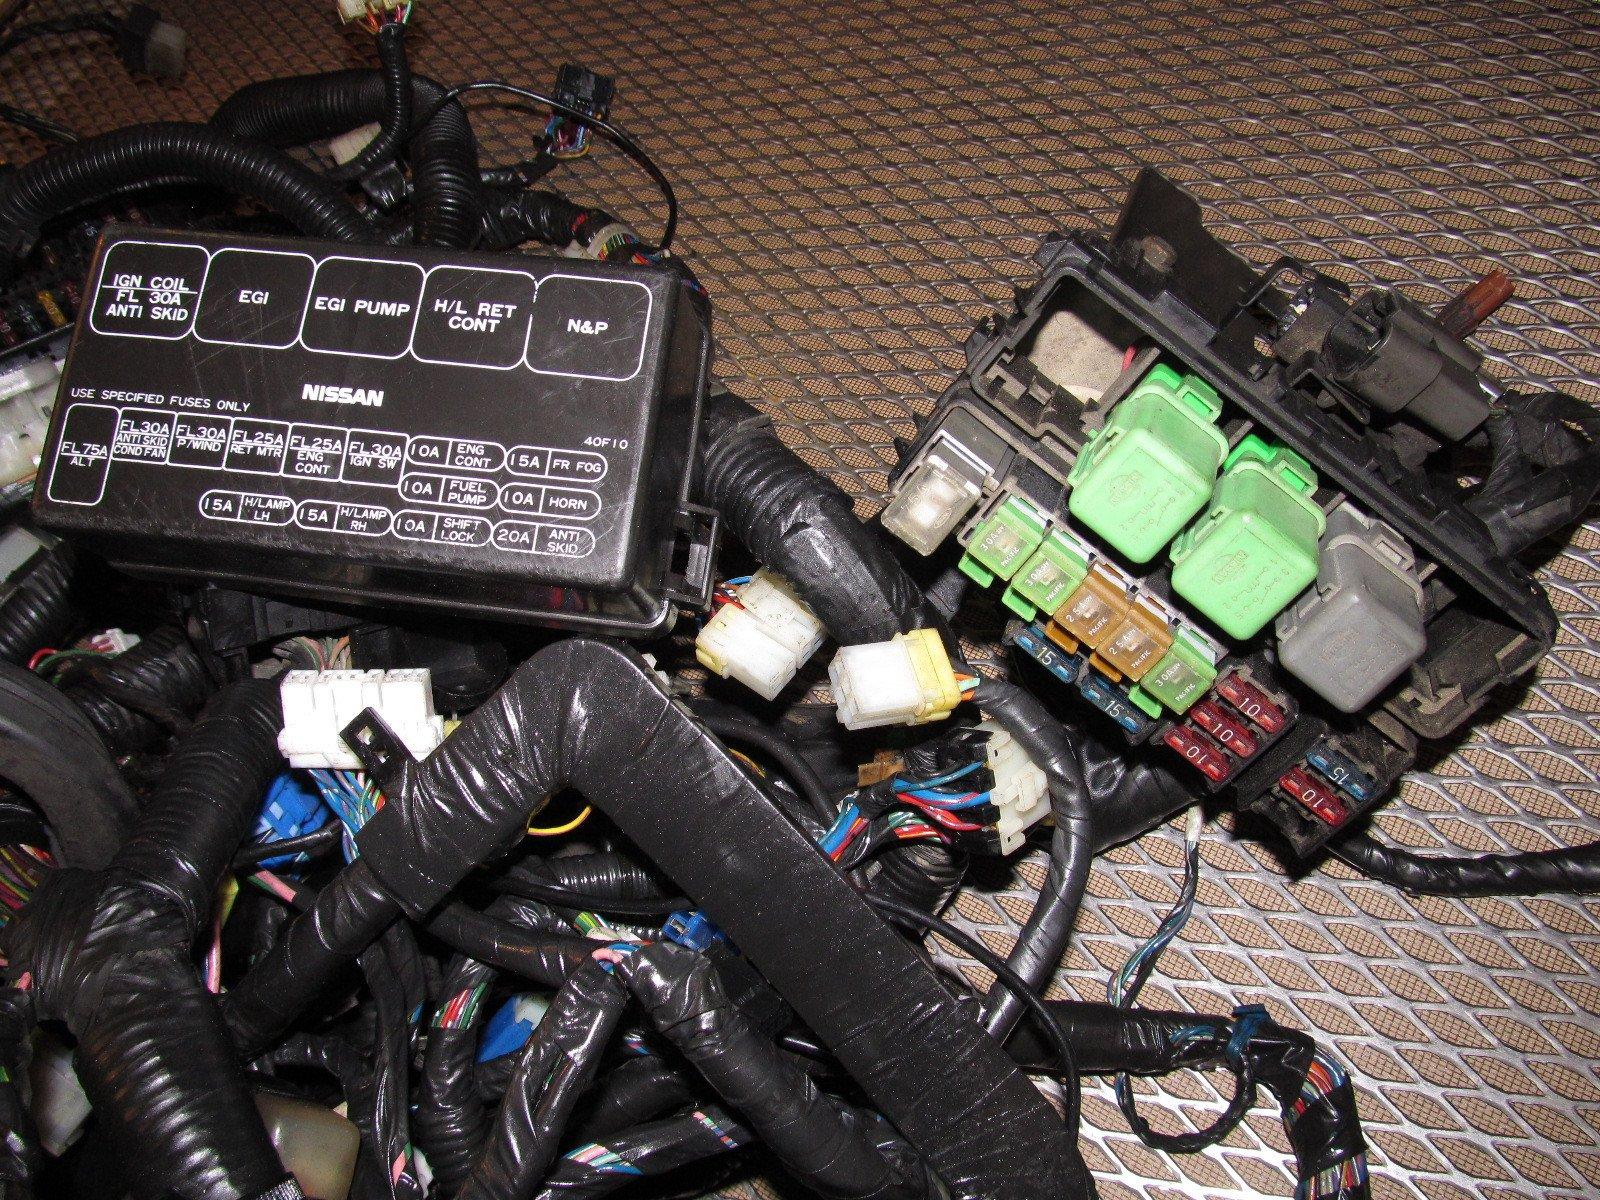 yamaha wr 125 fuse box - wiring diagram drop-information-b -  drop-information-b.led-illumina.it  led-illumina.it